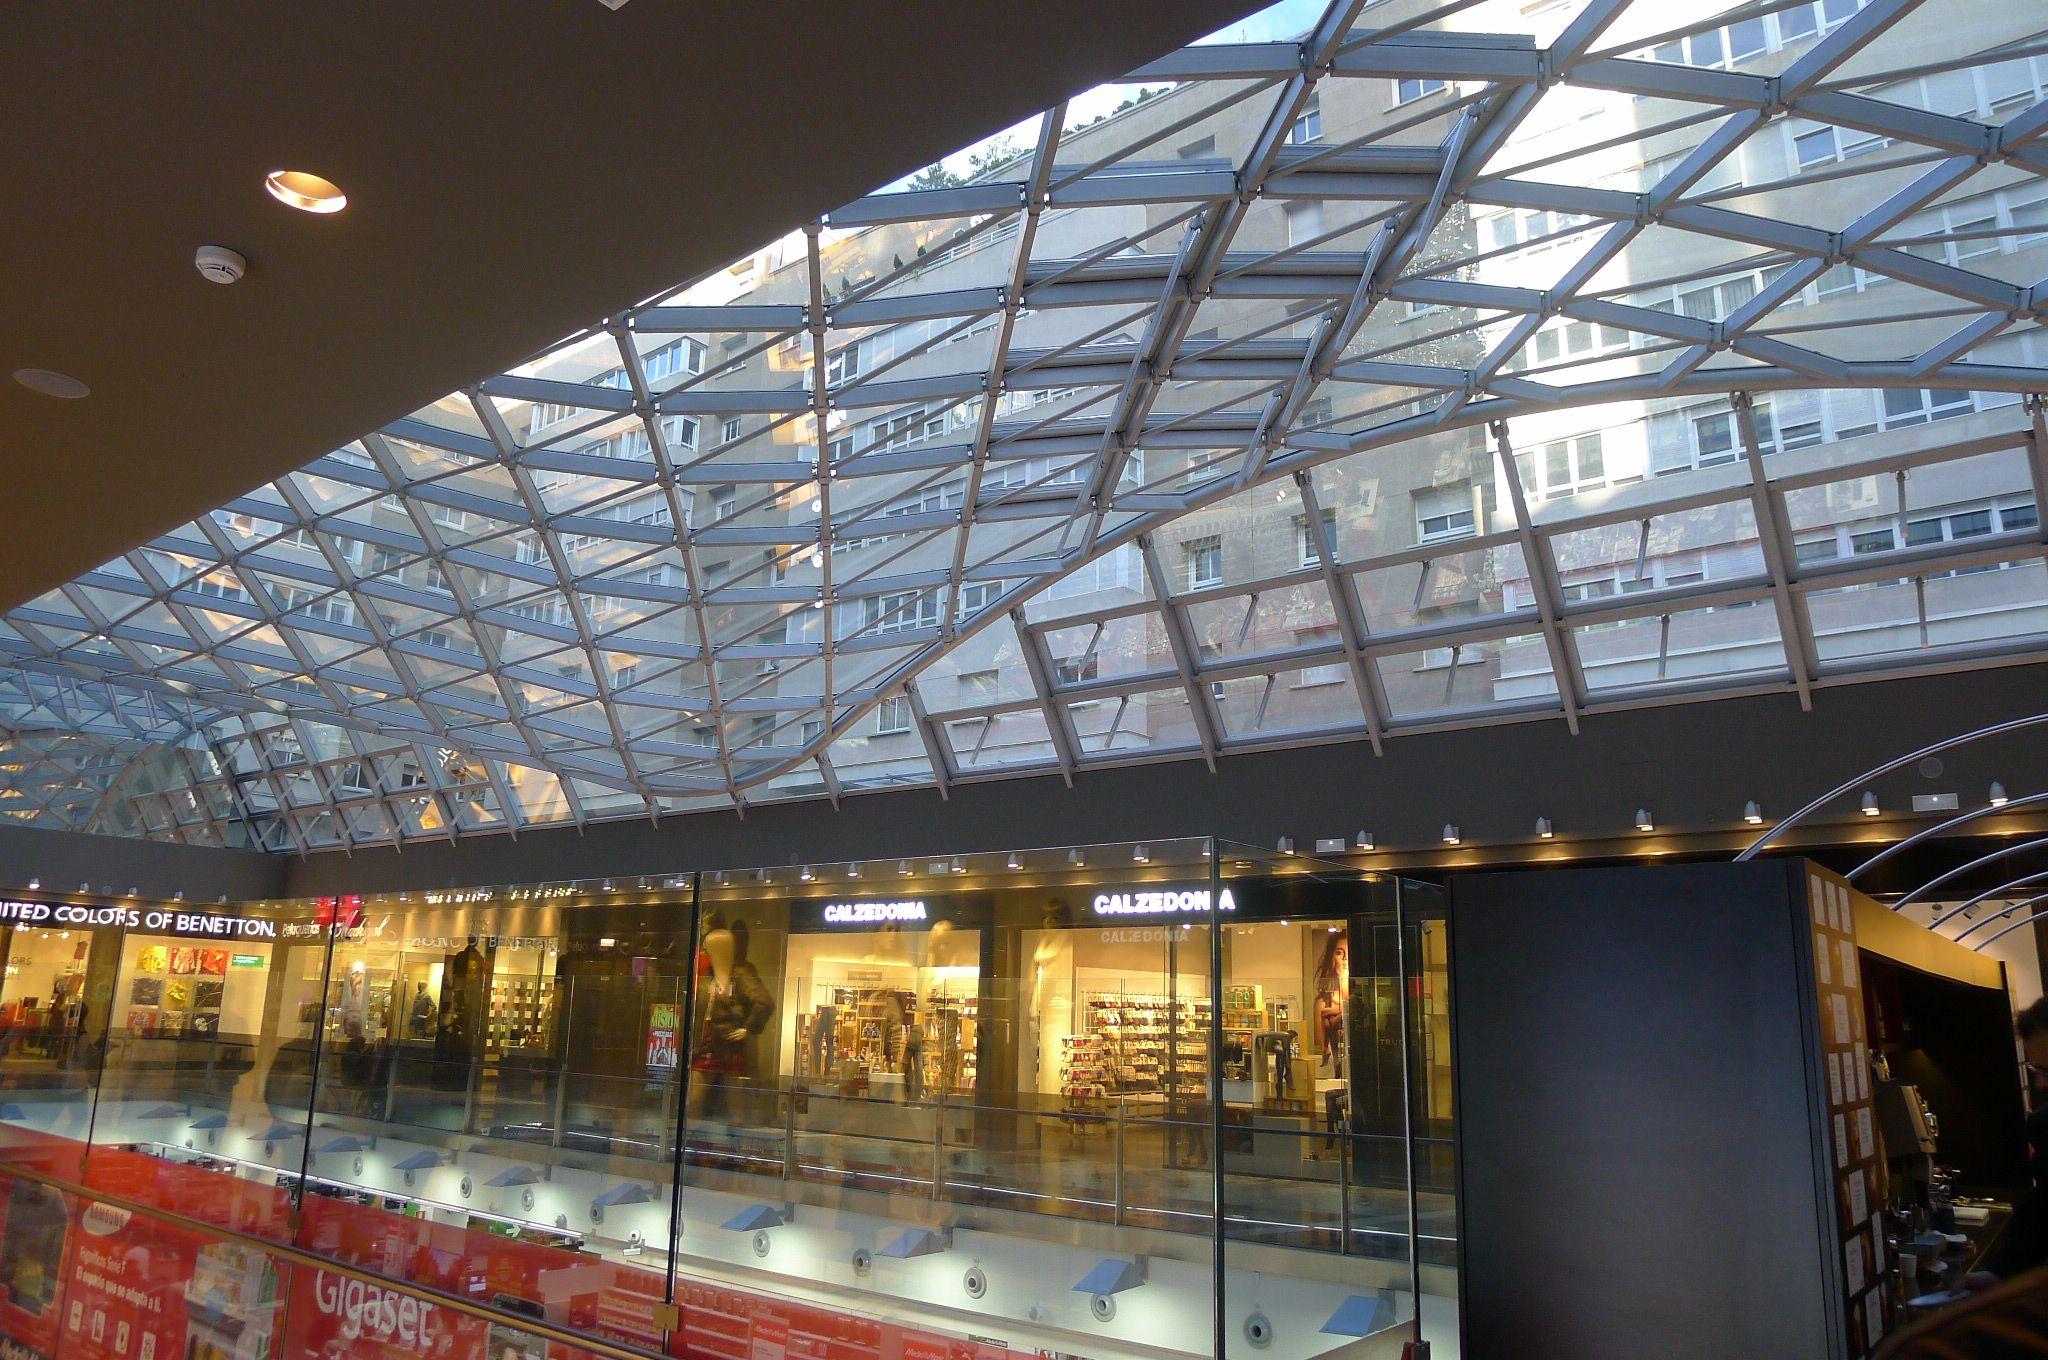 Calzedonia En Paseo Comercial Madrid Con Imagenes Edificios